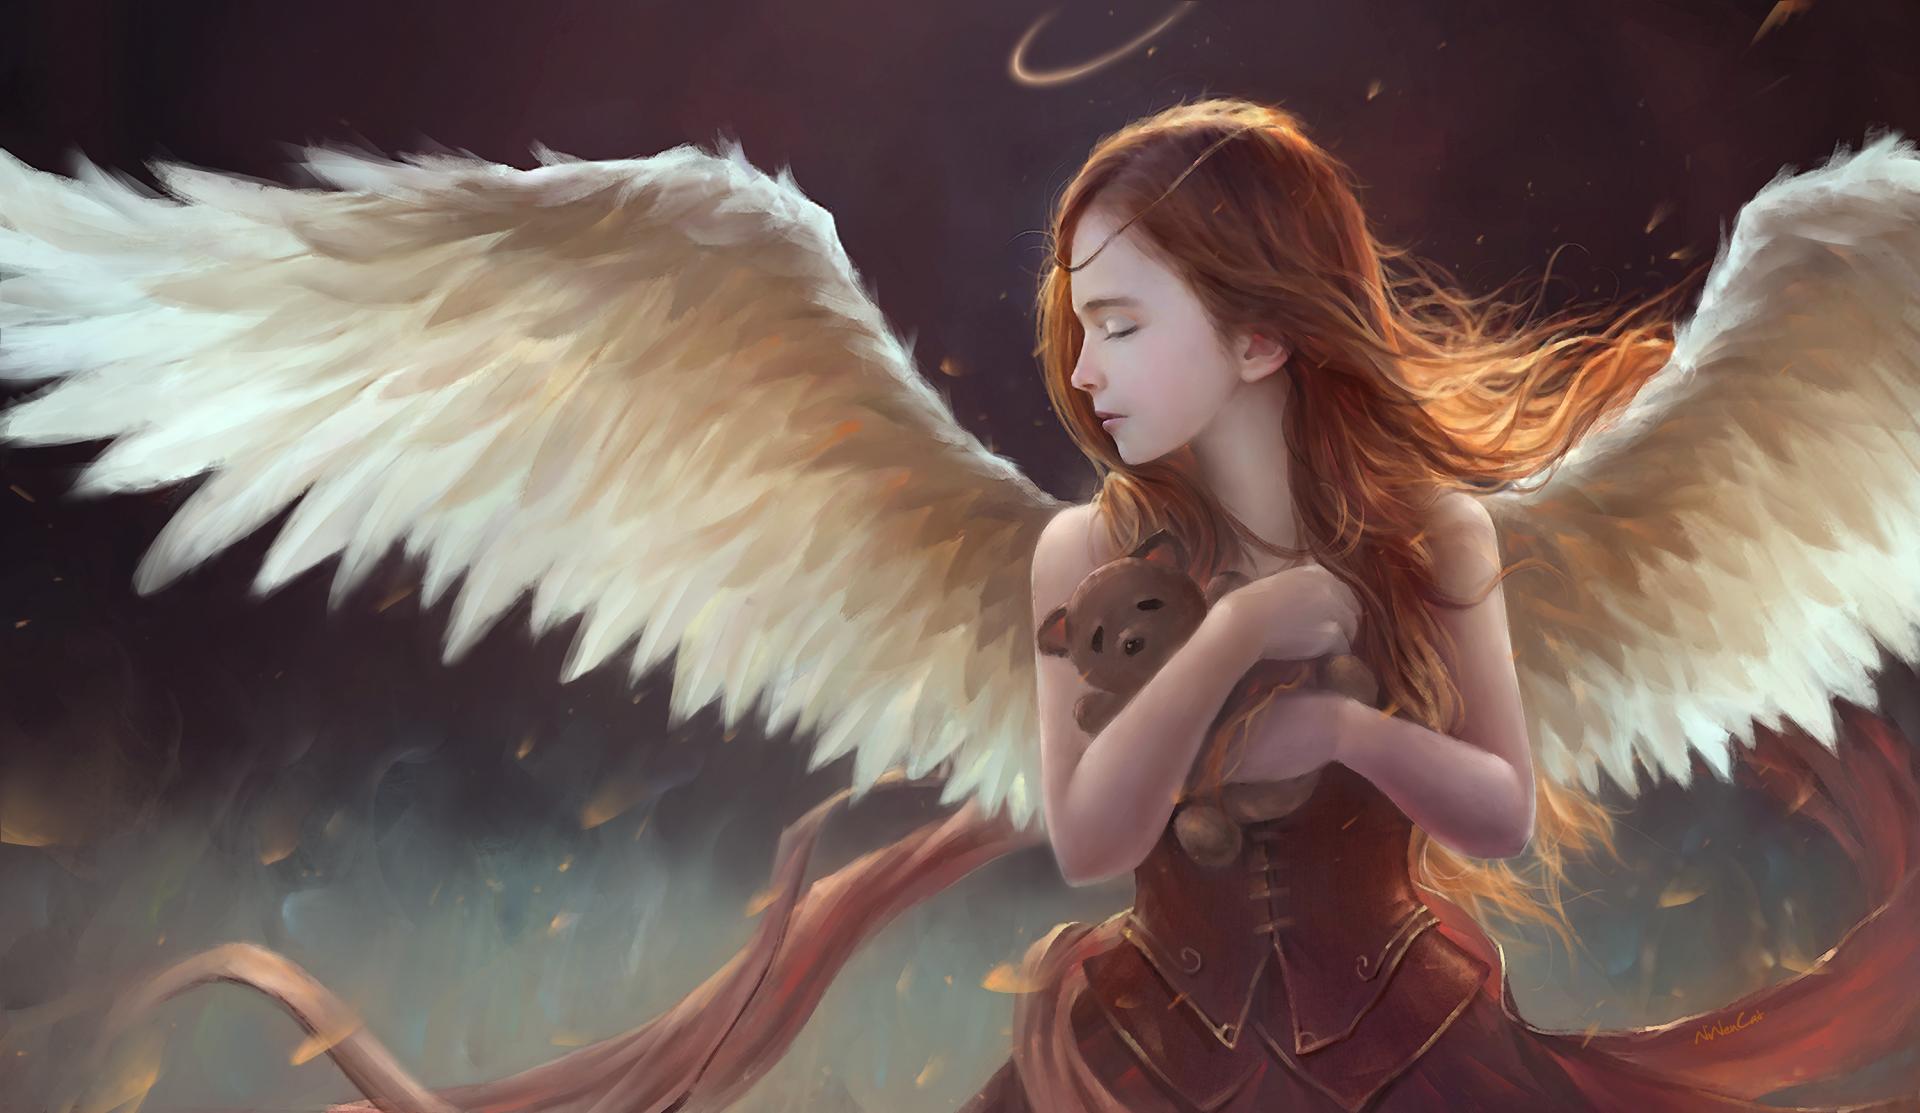 Fantasy - Angel  Wings Girl Child Fantasy Teddy Bear Wallpaper